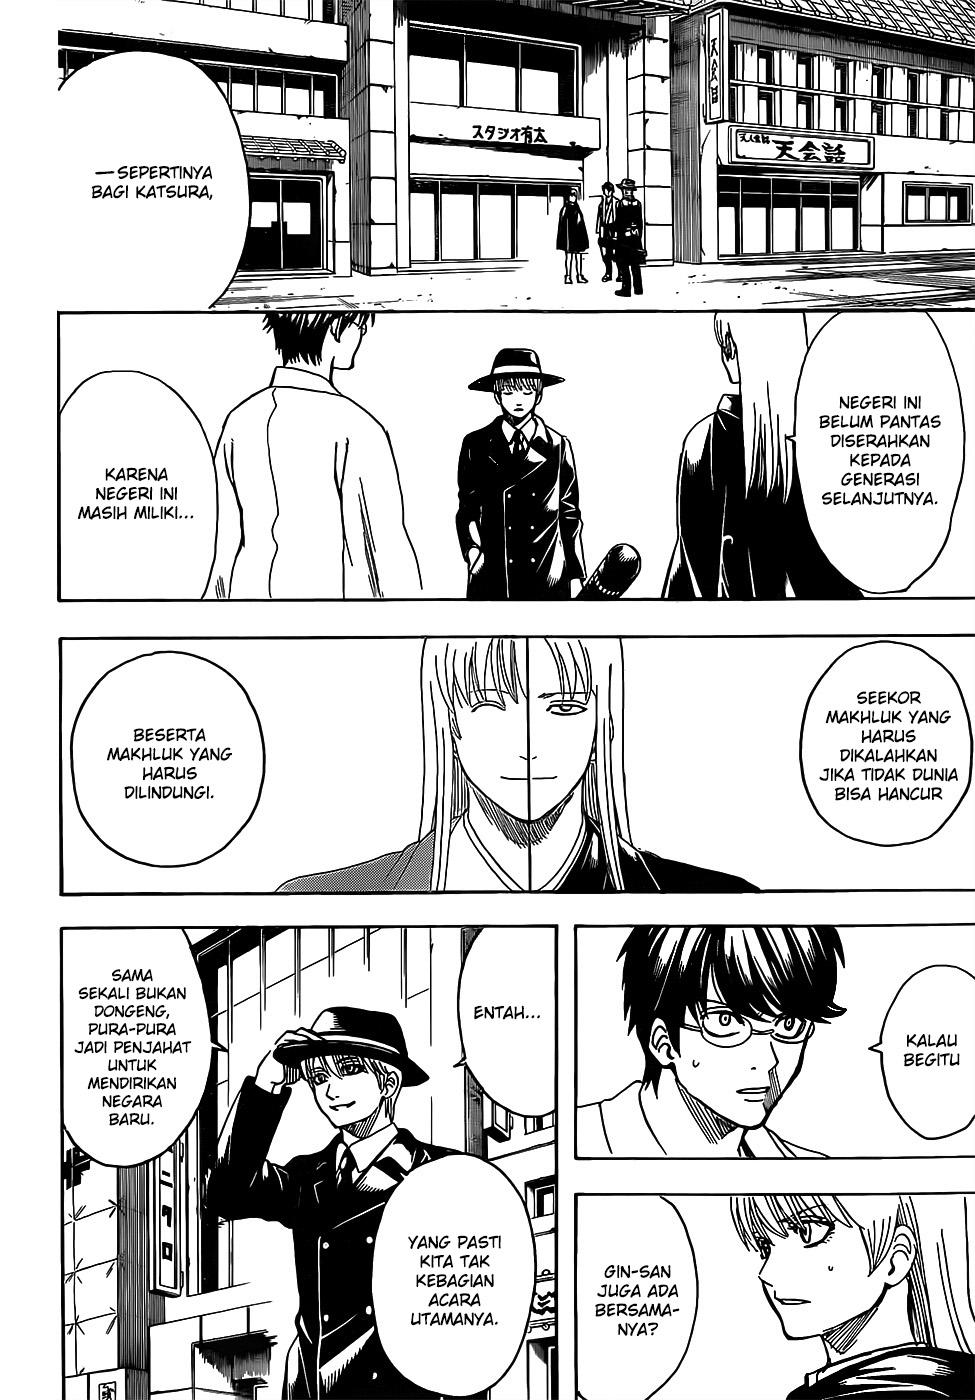 Gintama Chapter 692-5